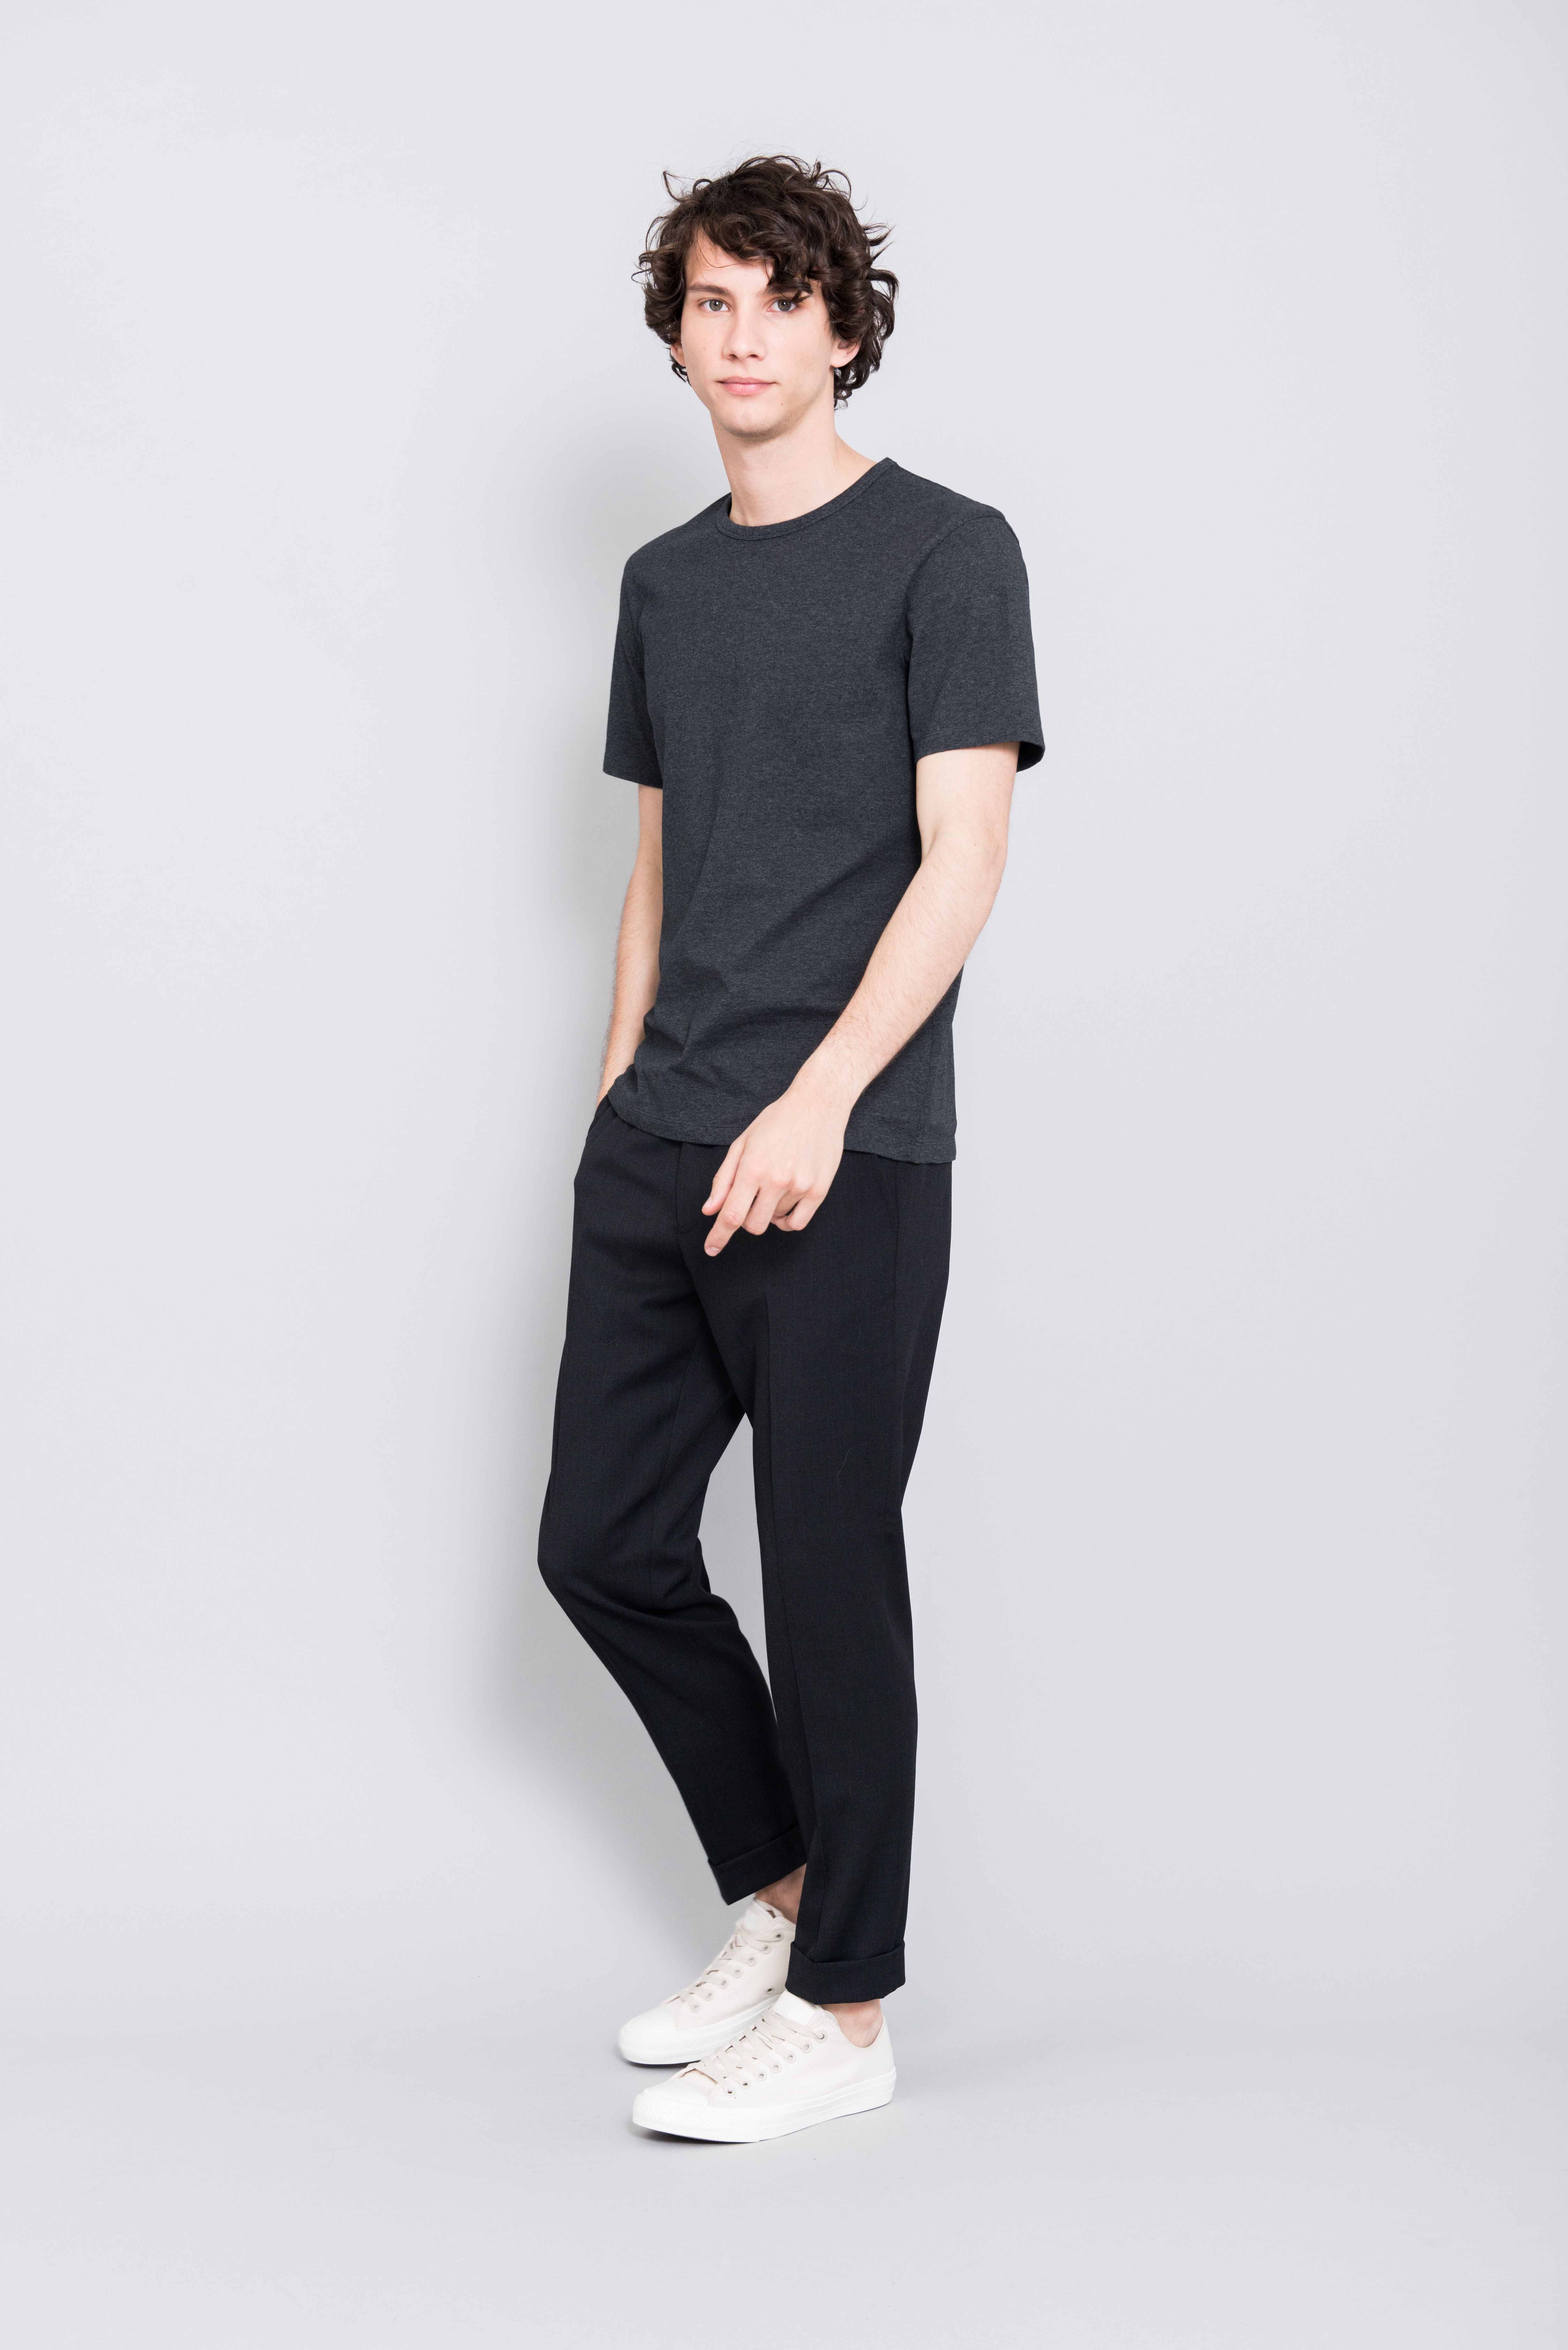 Danny zuko black t shirt - The Asket T Shirt In Charcoal Melange Asket